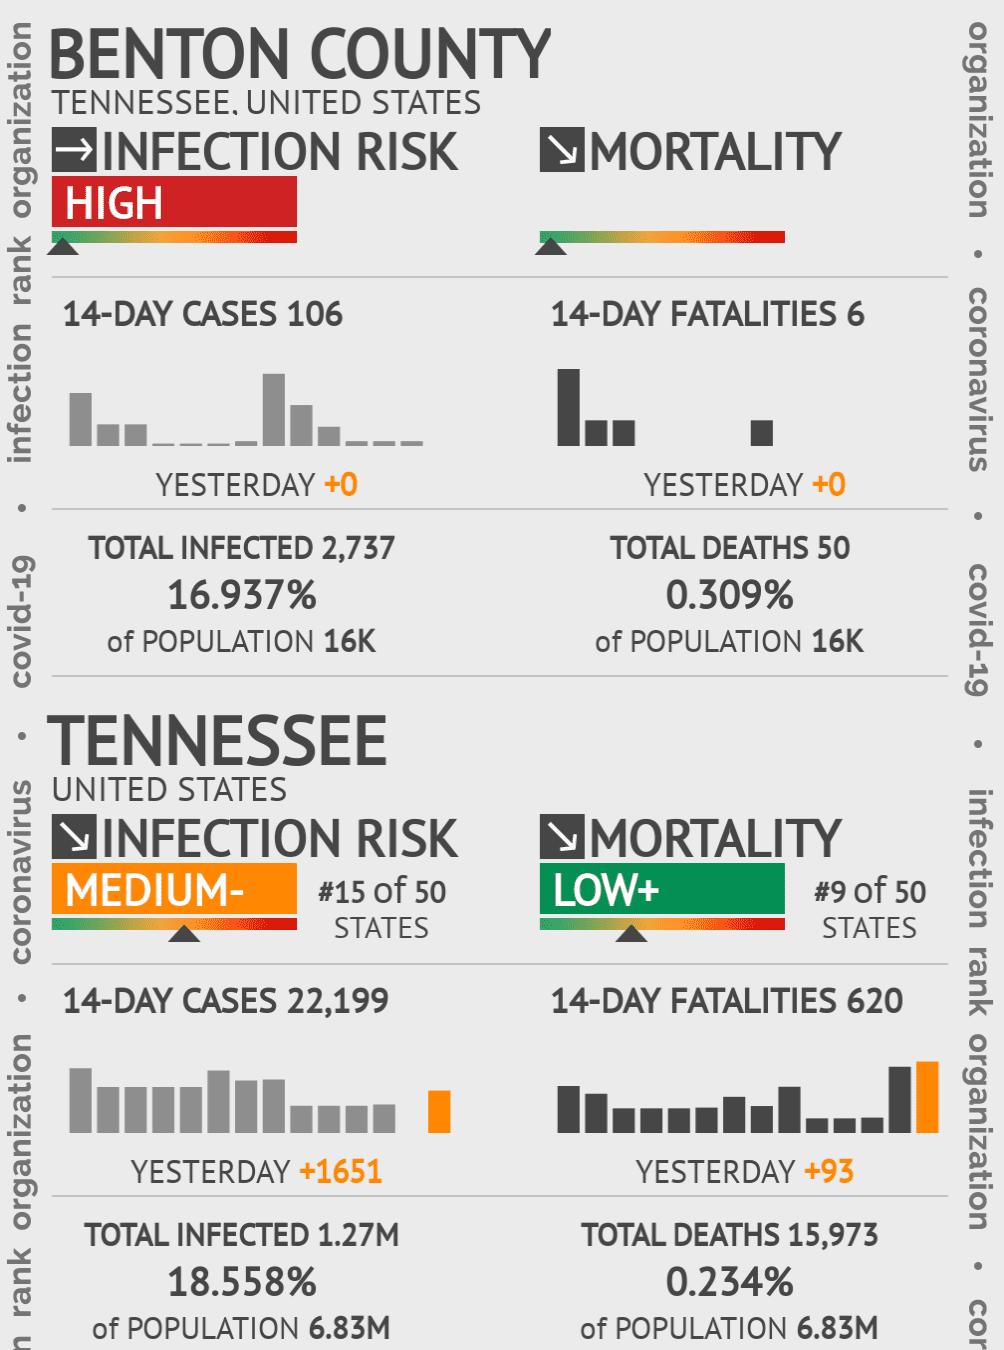 Benton County Coronavirus Covid-19 Risk of Infection on July 24, 2021